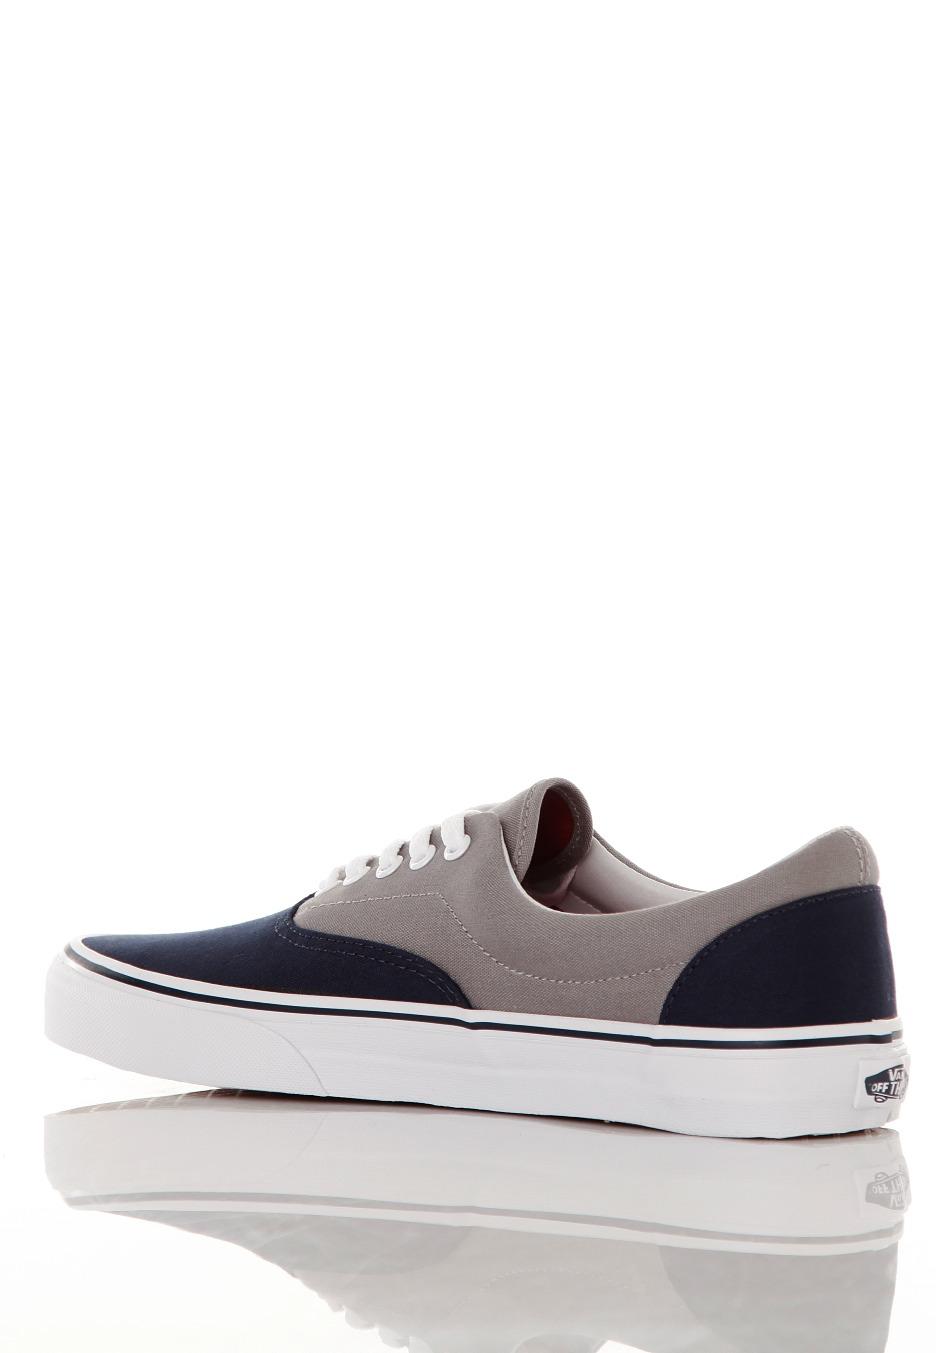 8faee77f1e Vans - Era Pop Frost Grey Dress Blues - Shoes - Impericon.com UK